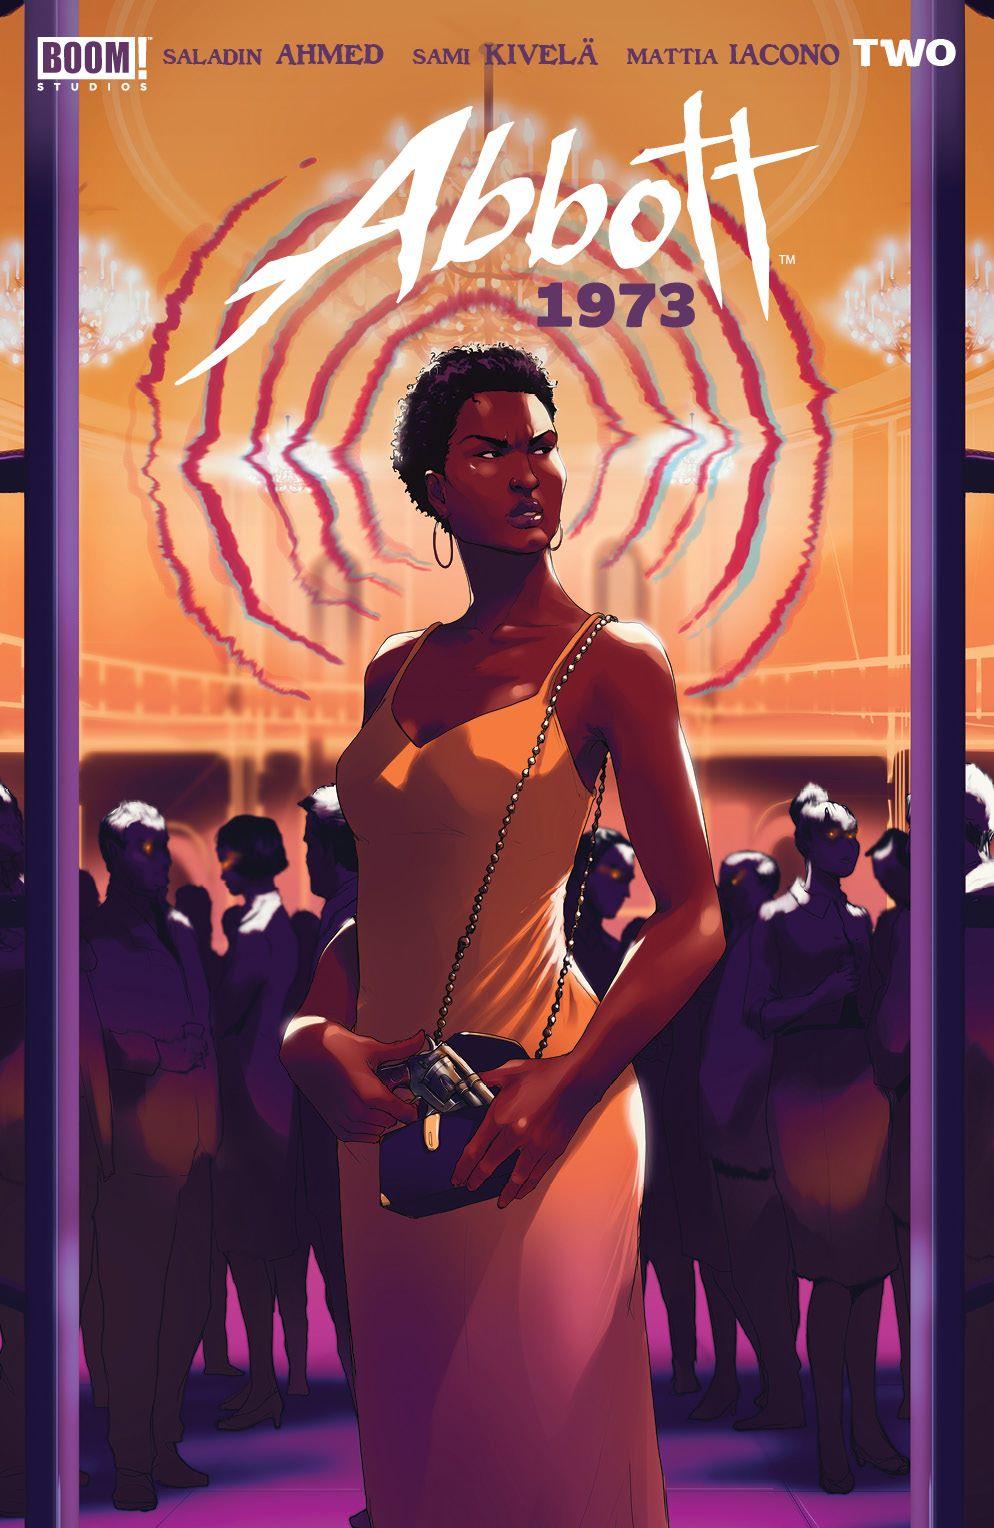 Abbott_1973_002_Cover_A_Main ComicList: BOOM! Studios New Releases for 02/17/2021